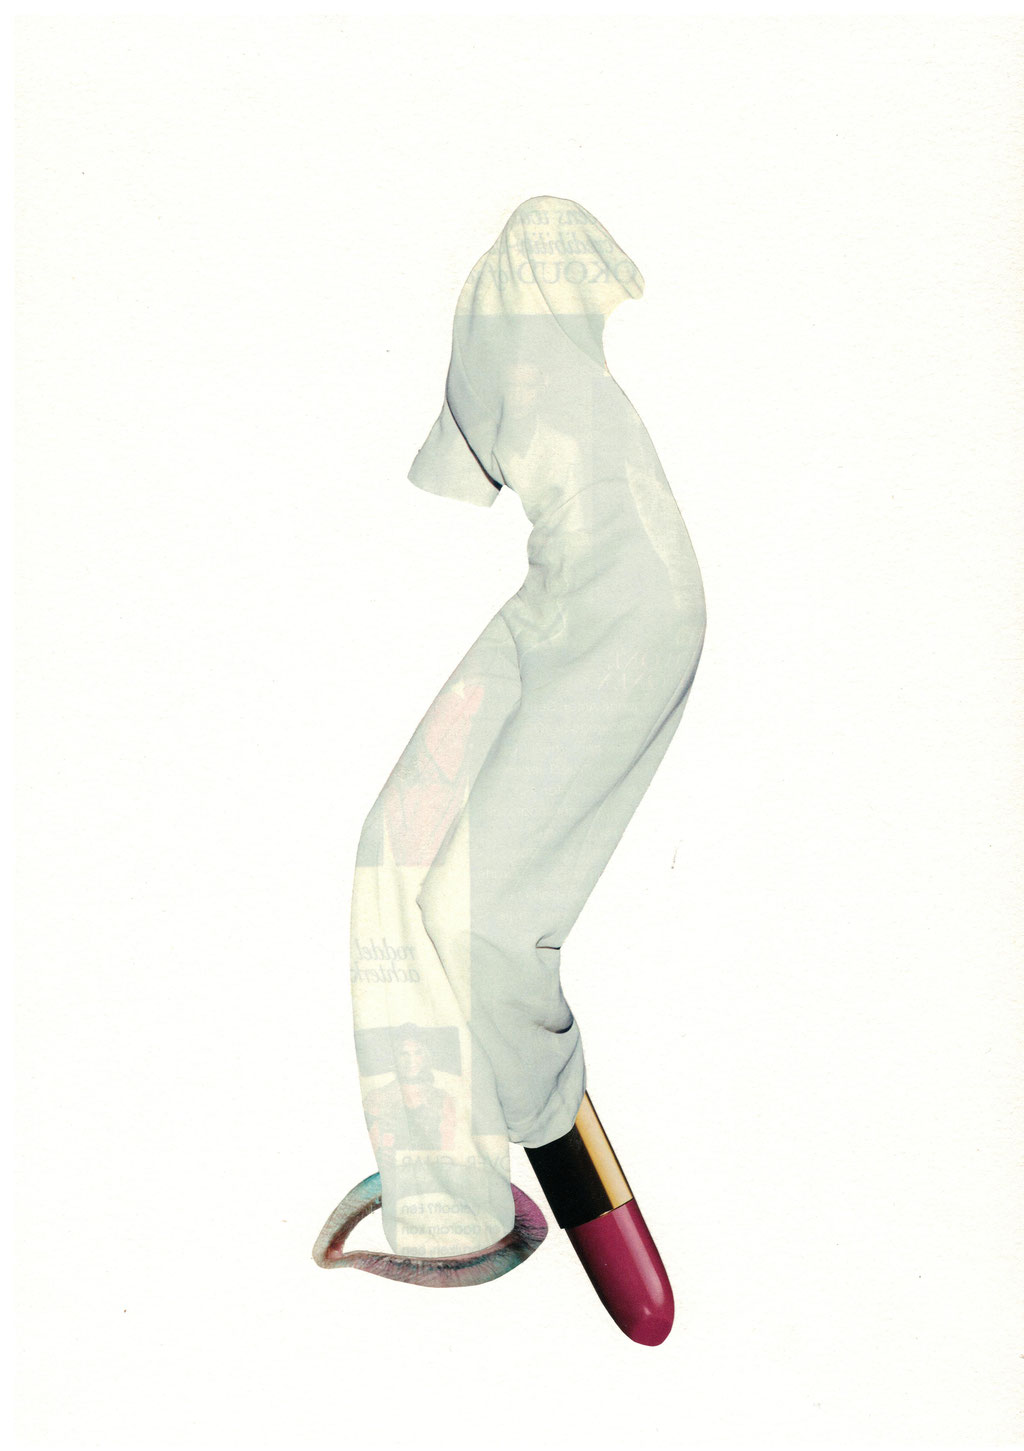 Limping, 20,5 x 29,5 cm, 2017